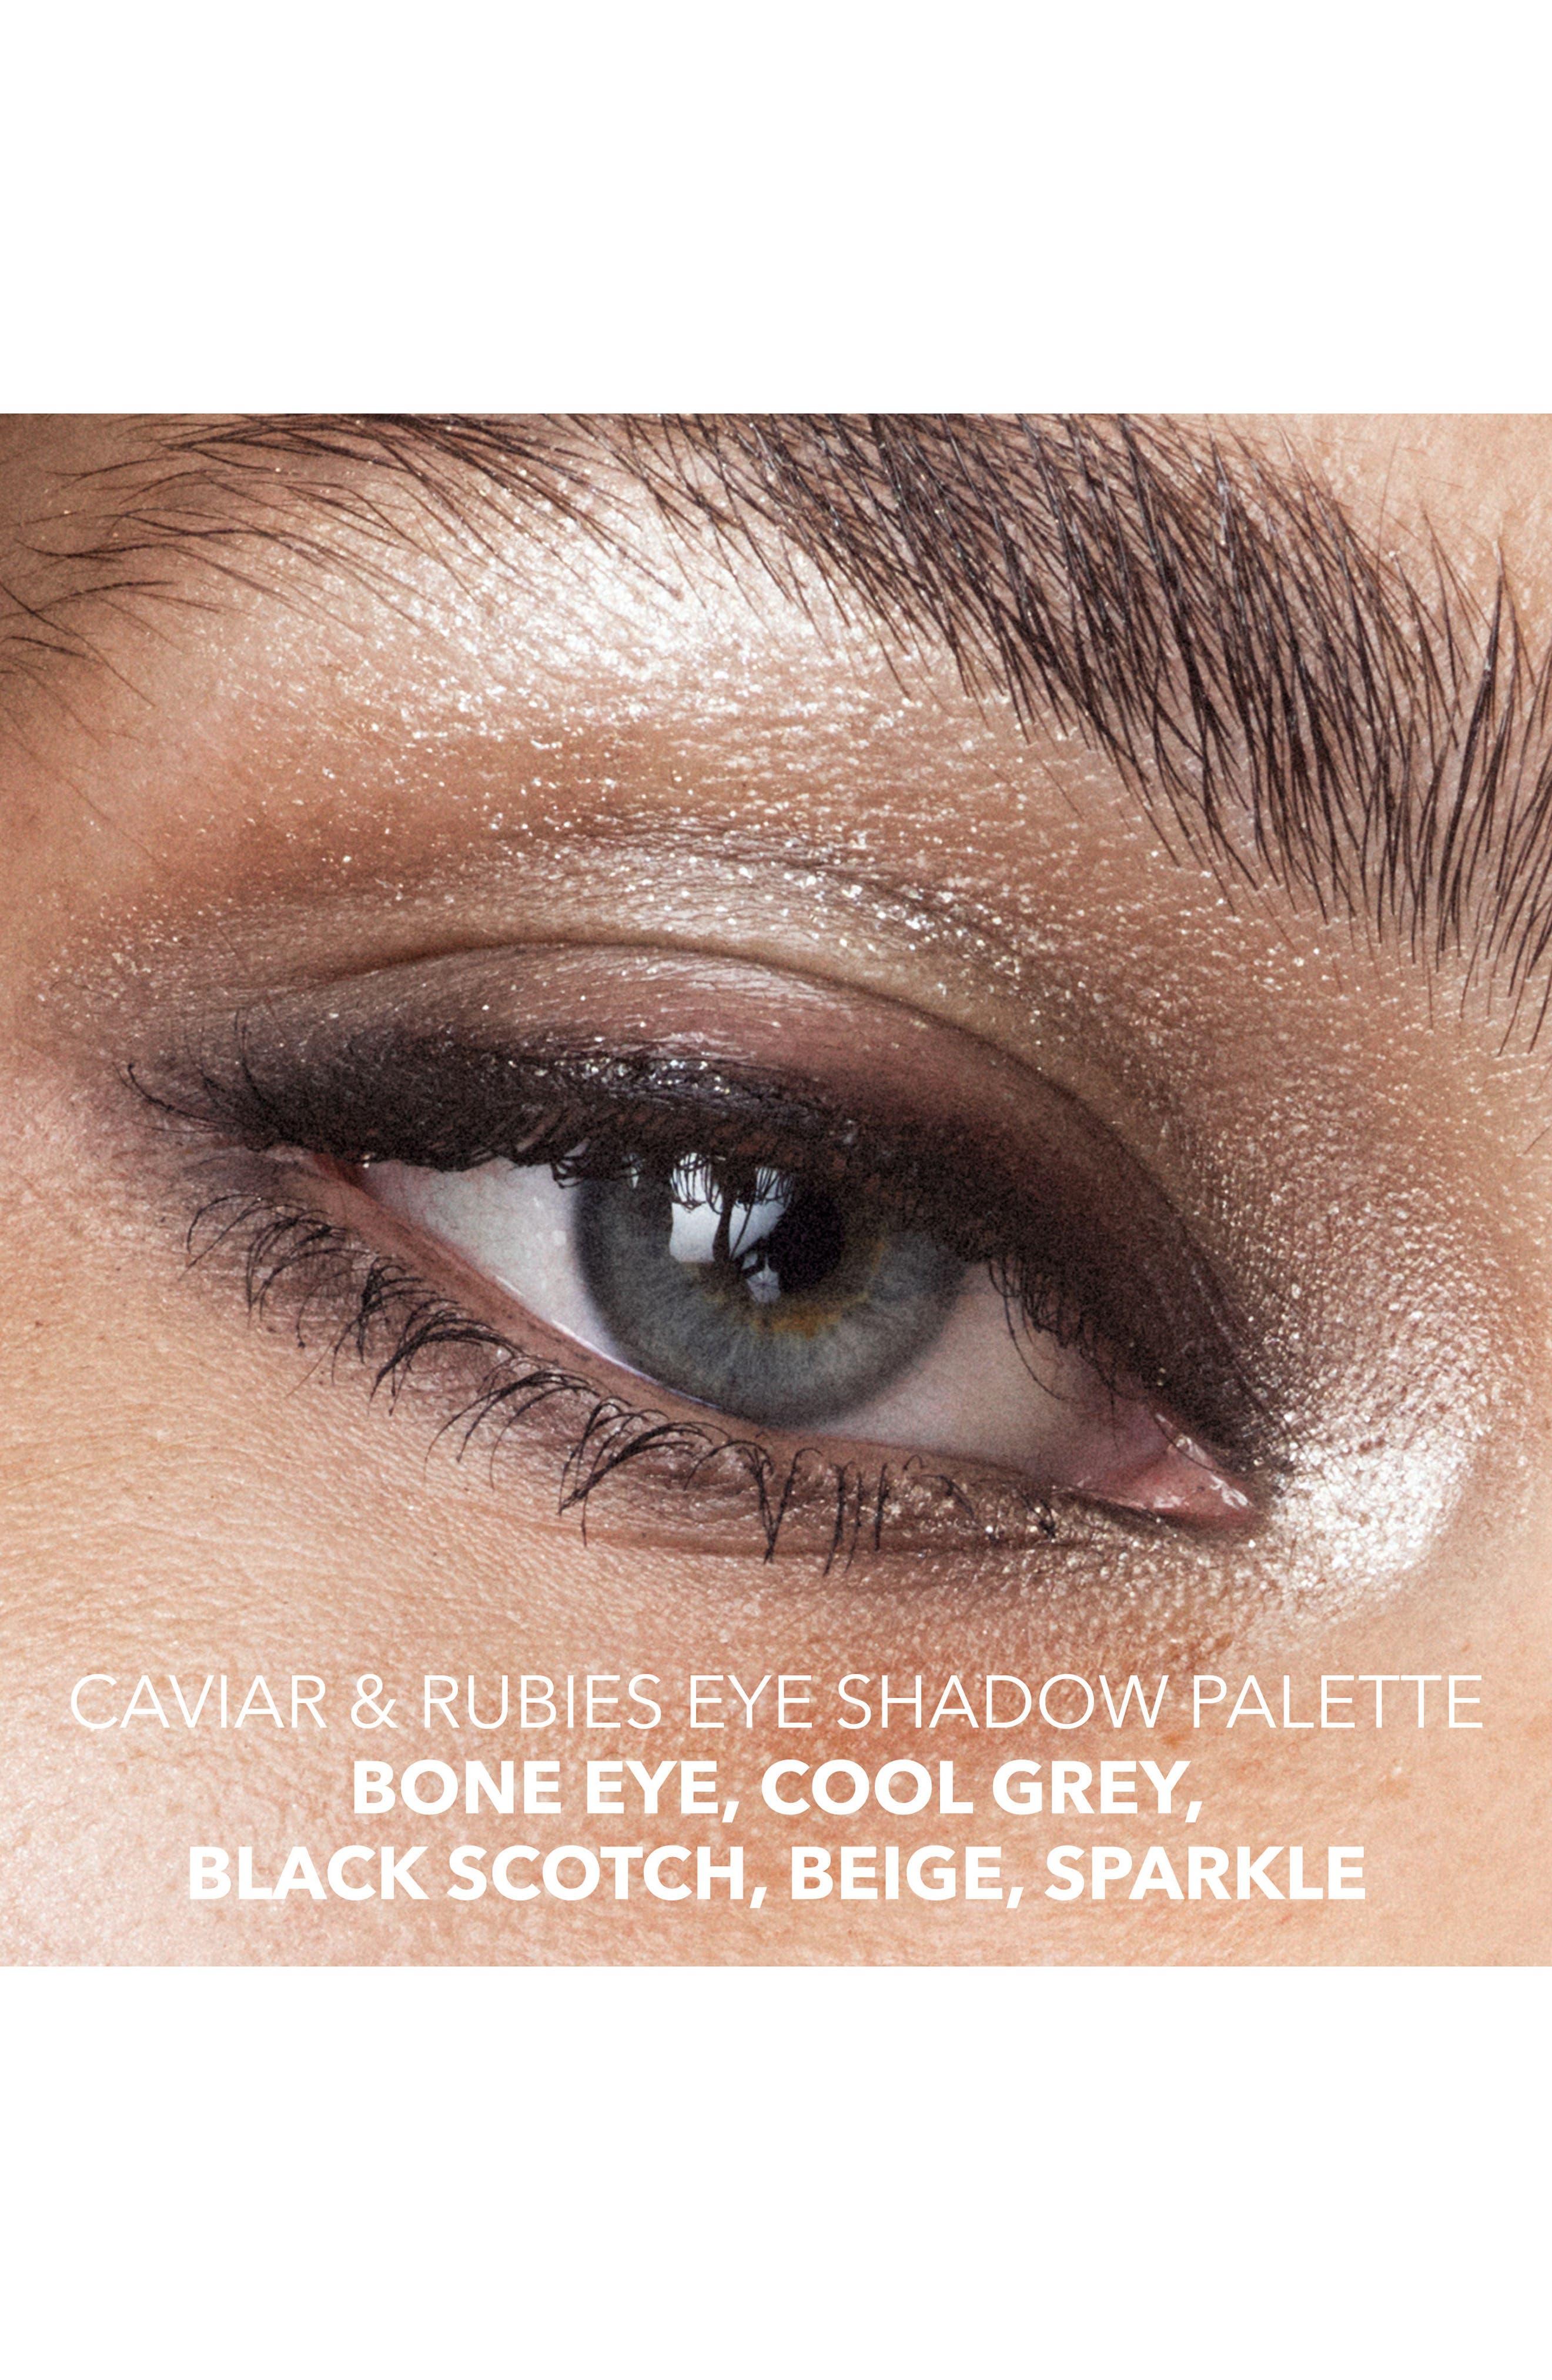 Caviar & Rubies Eyeshadow Palette,                             Alternate thumbnail 5, color,                             000